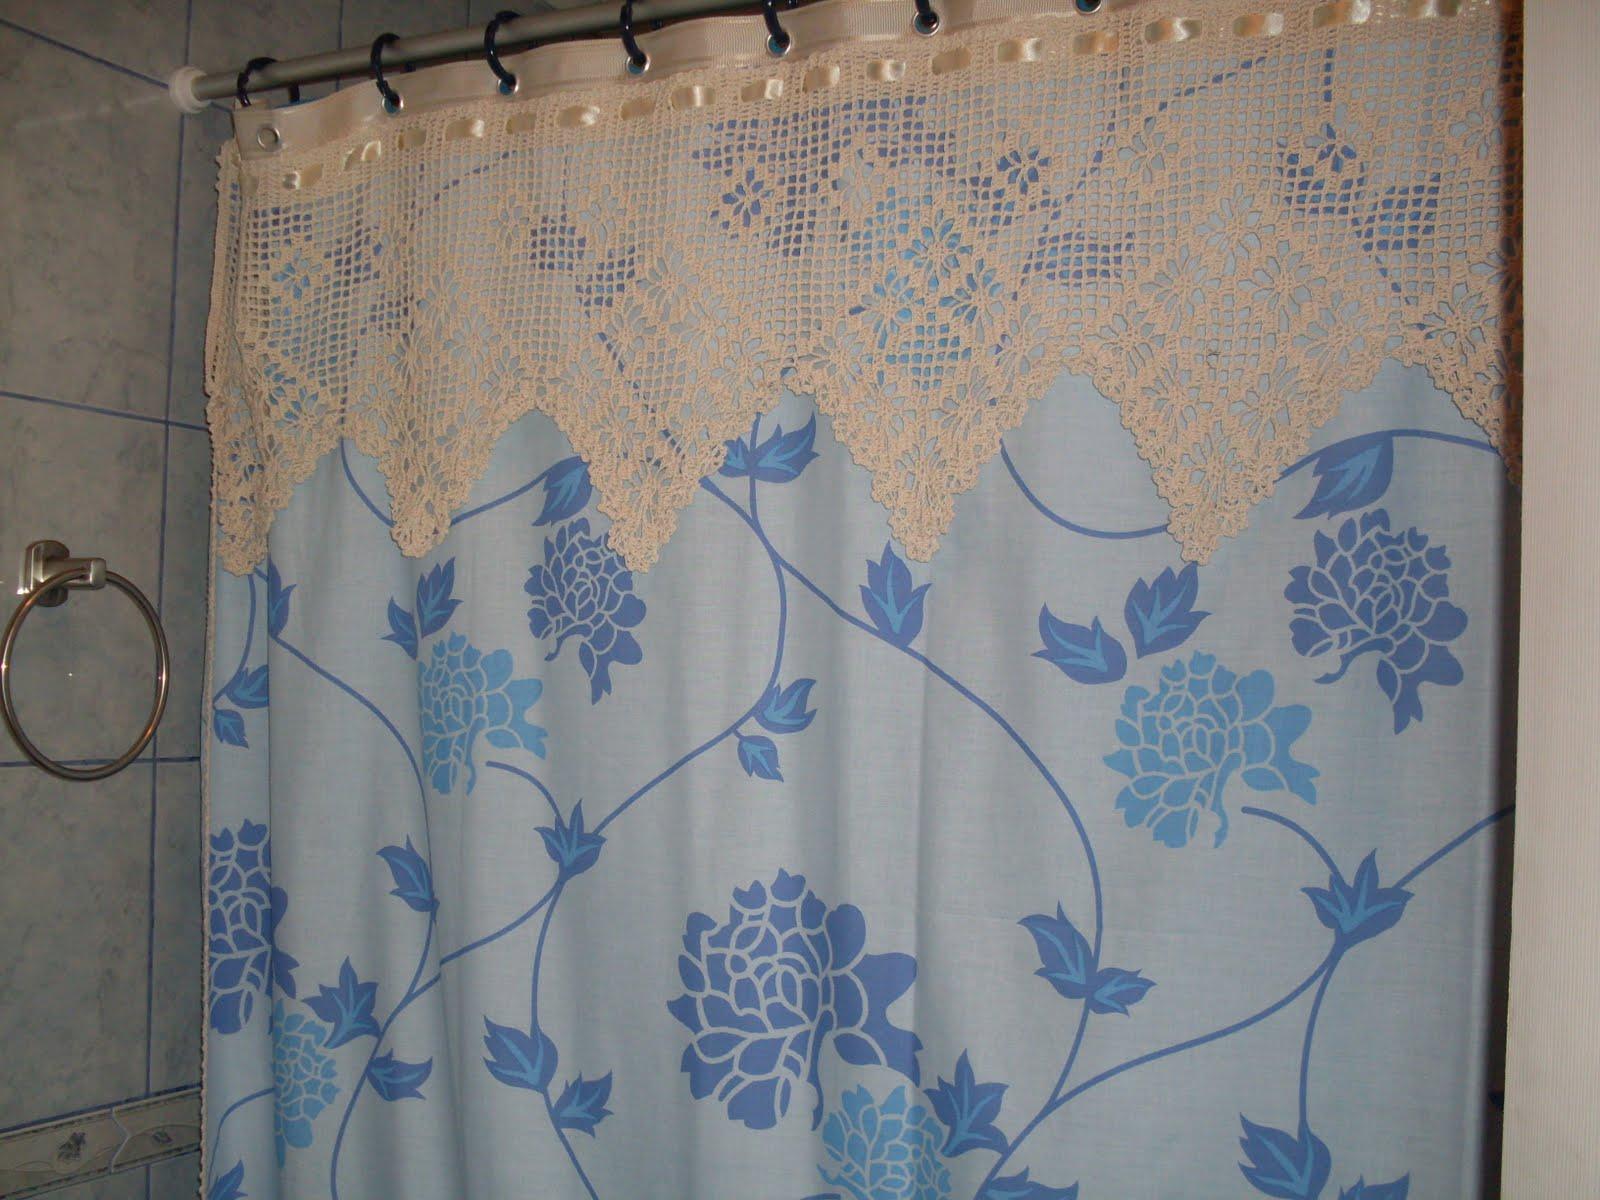 Kasalinda loncoche hermosas cortinas para ba os y accesorios for Accesorios para cortinas de bano